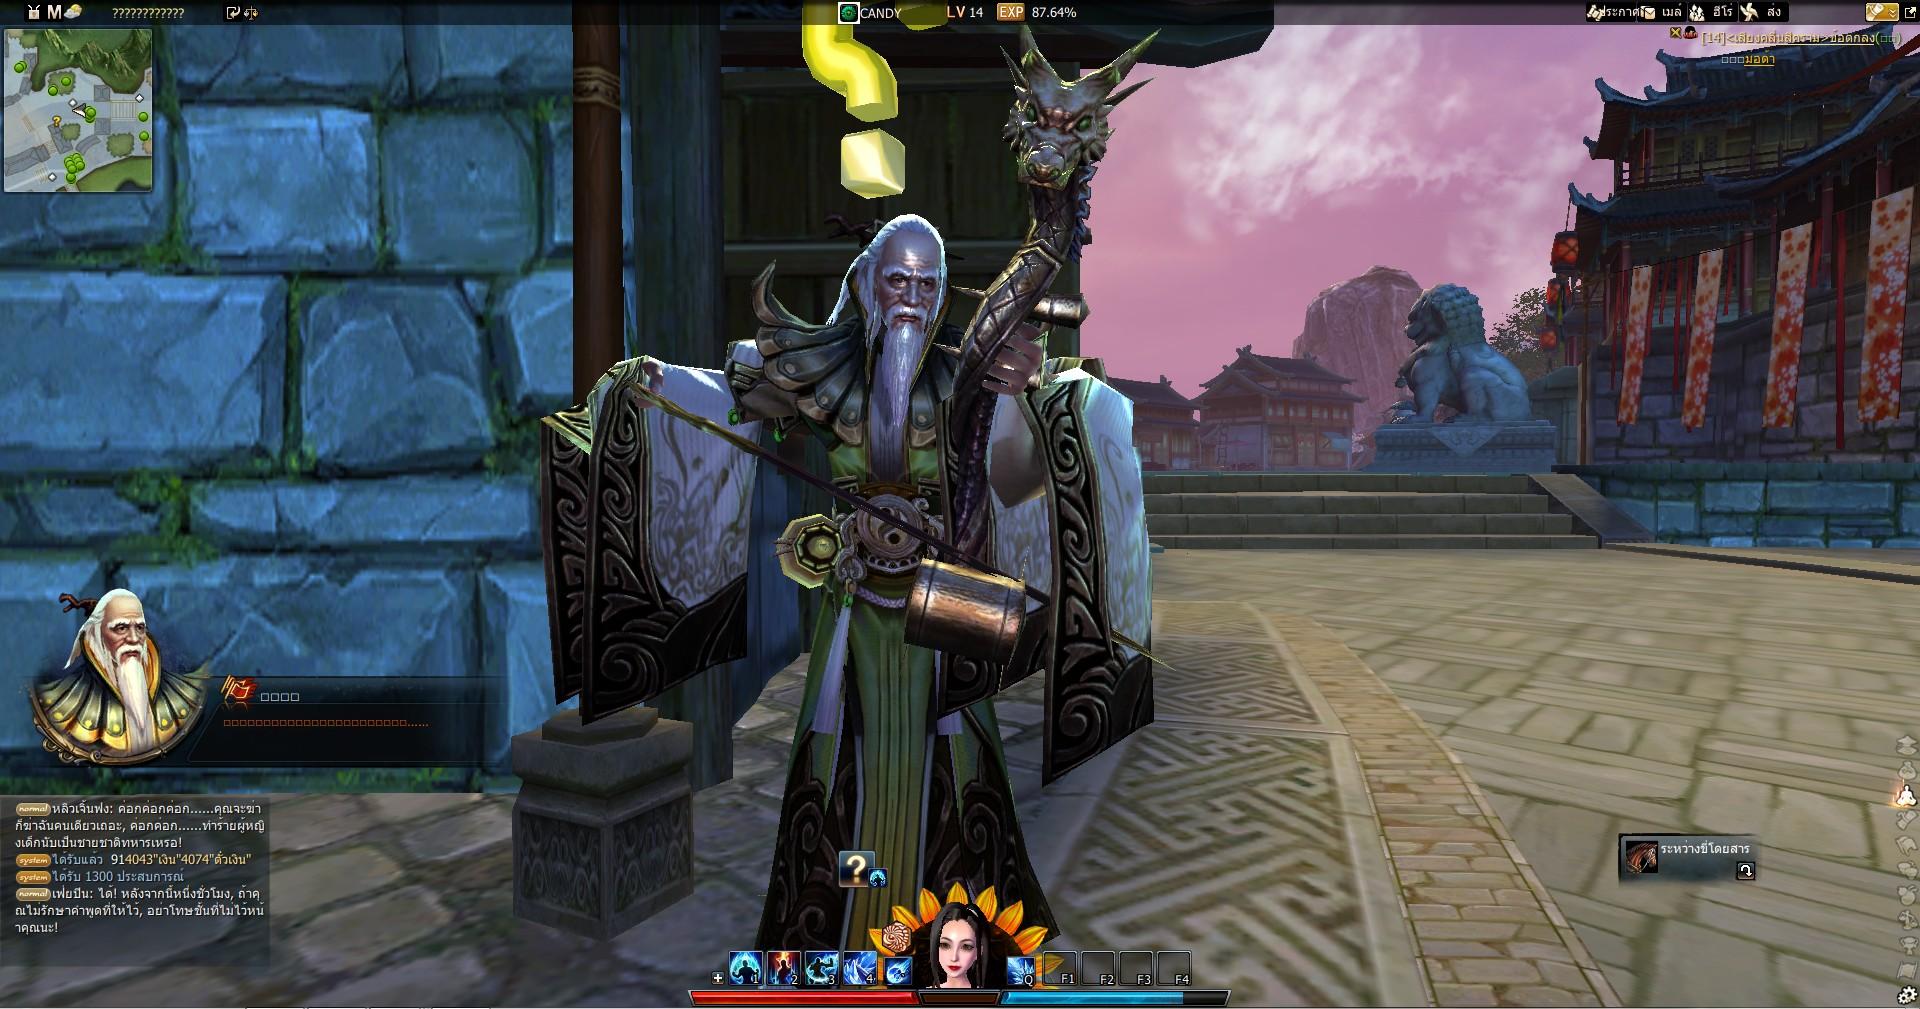 Swordsman 2372019 5